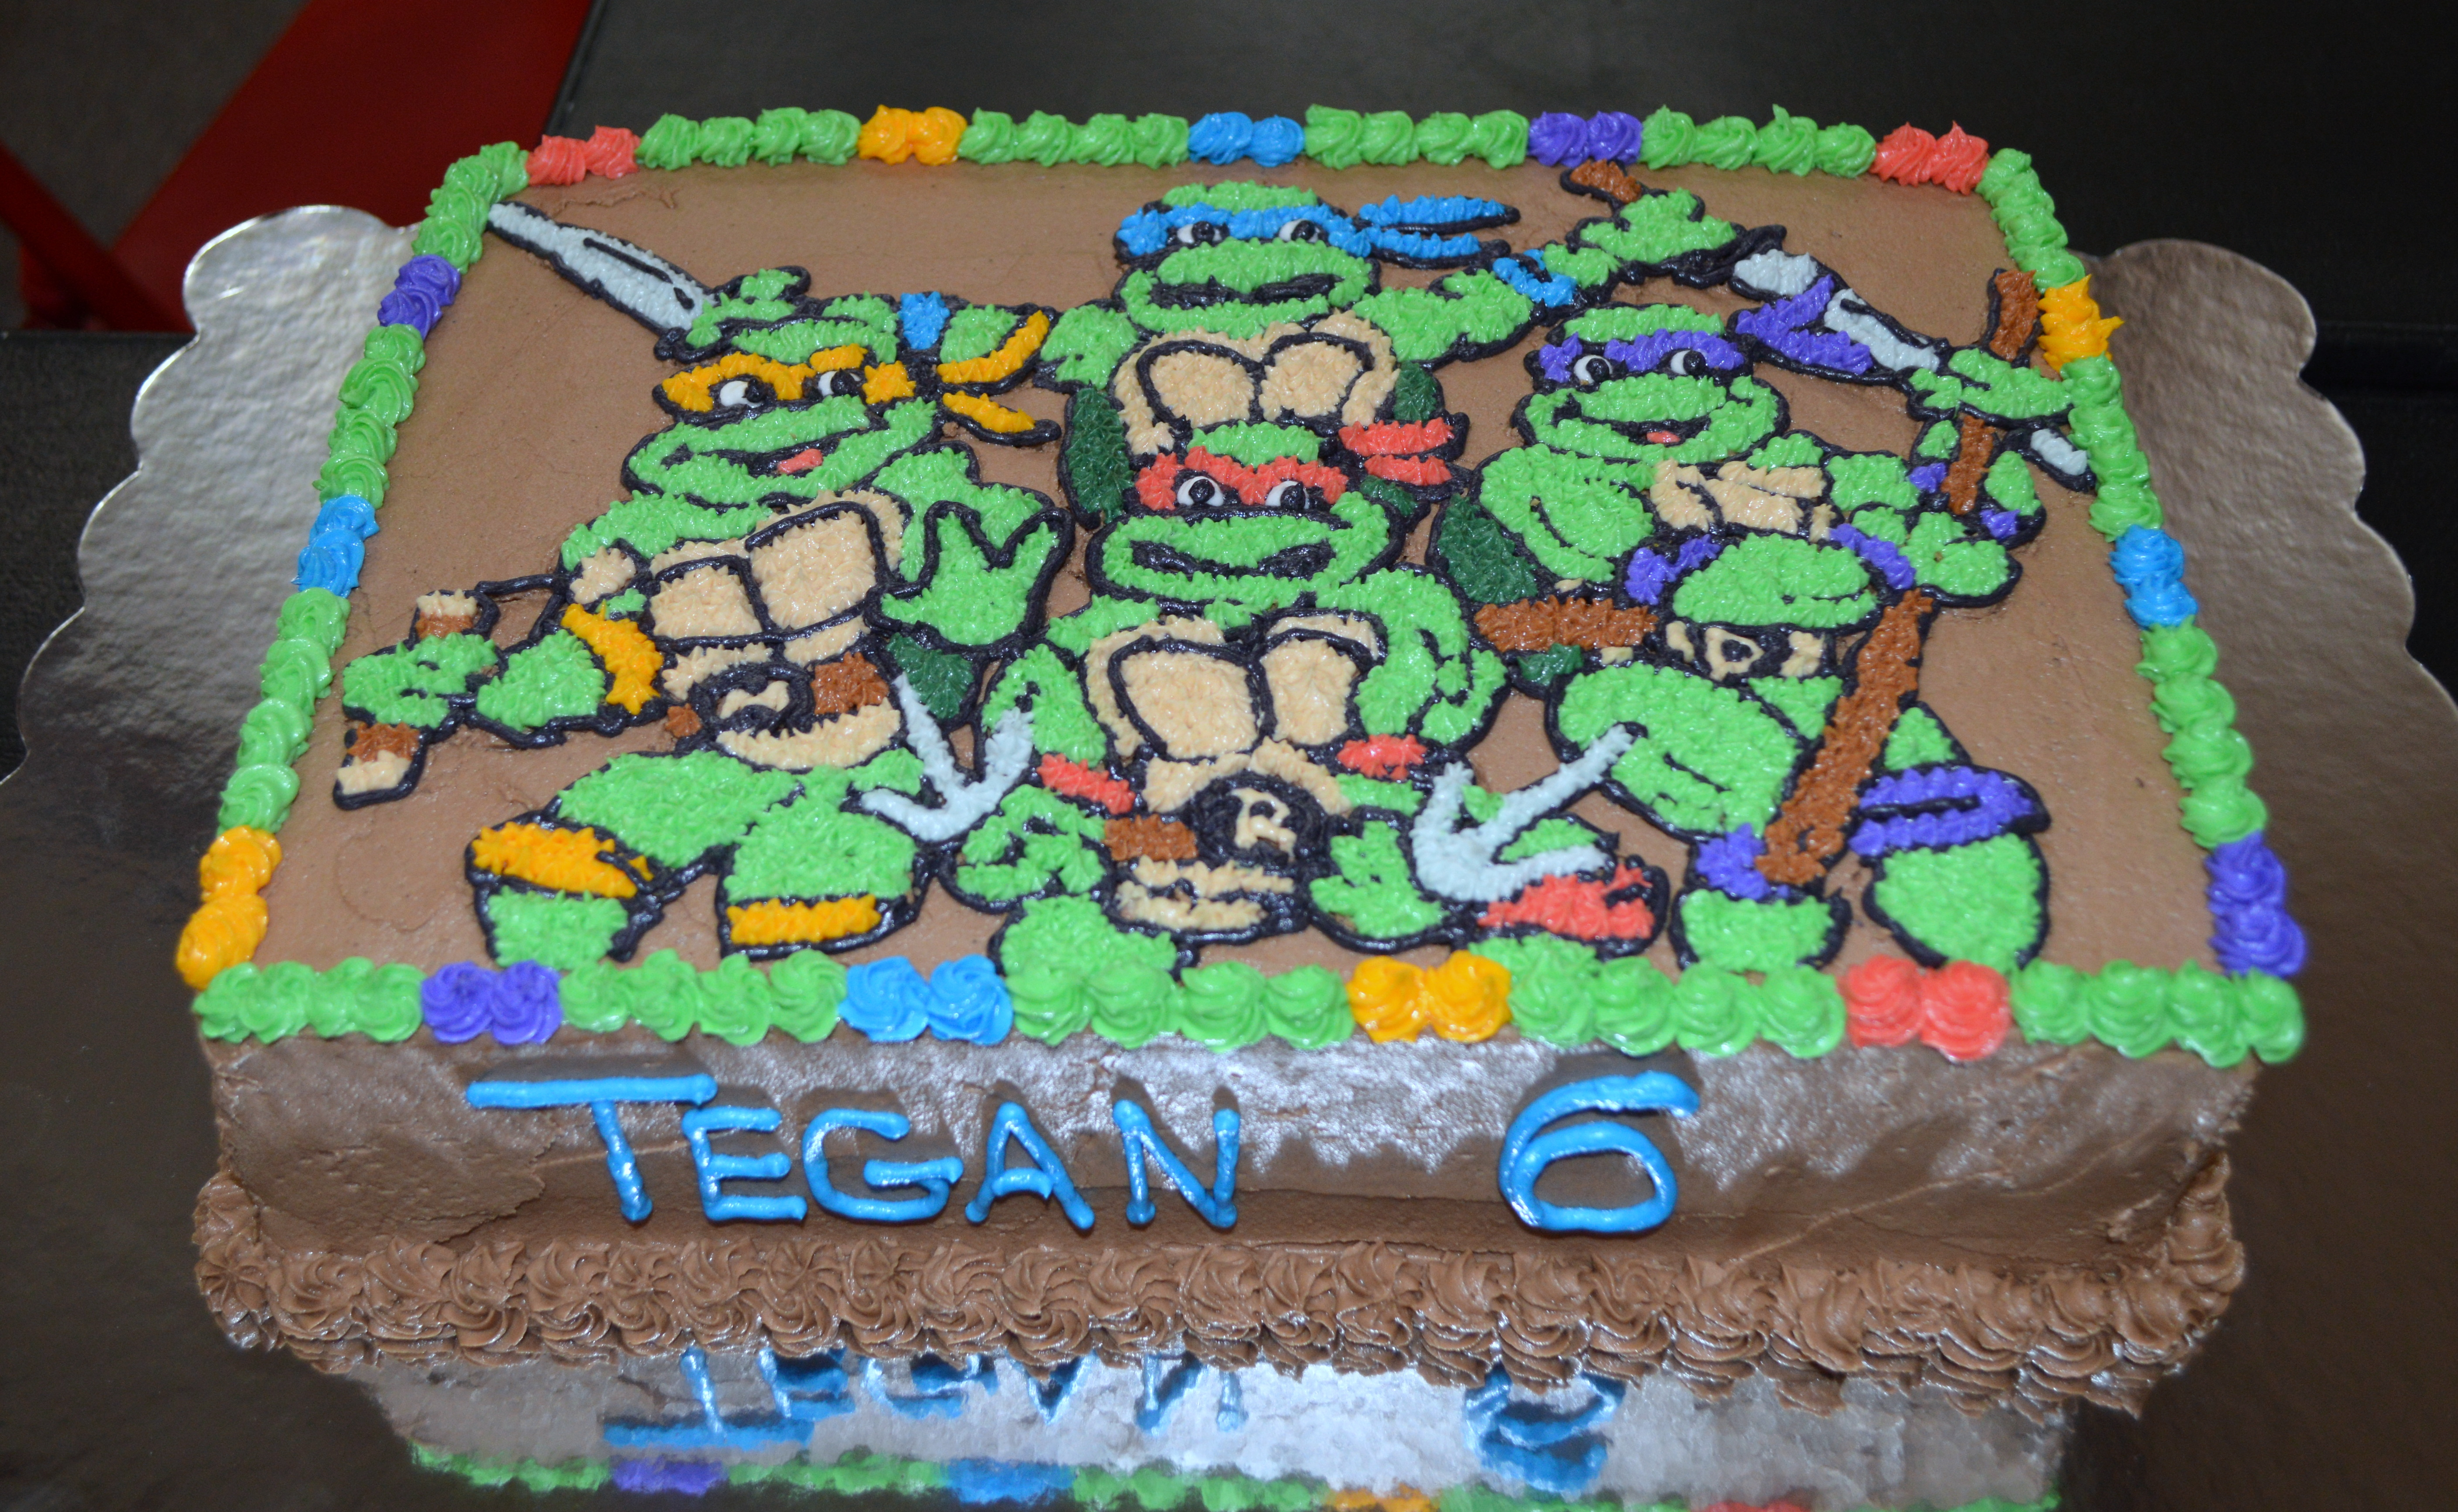 Teenage Mutant Ninja Turtles Sheet Cake Erkalnathandedecker